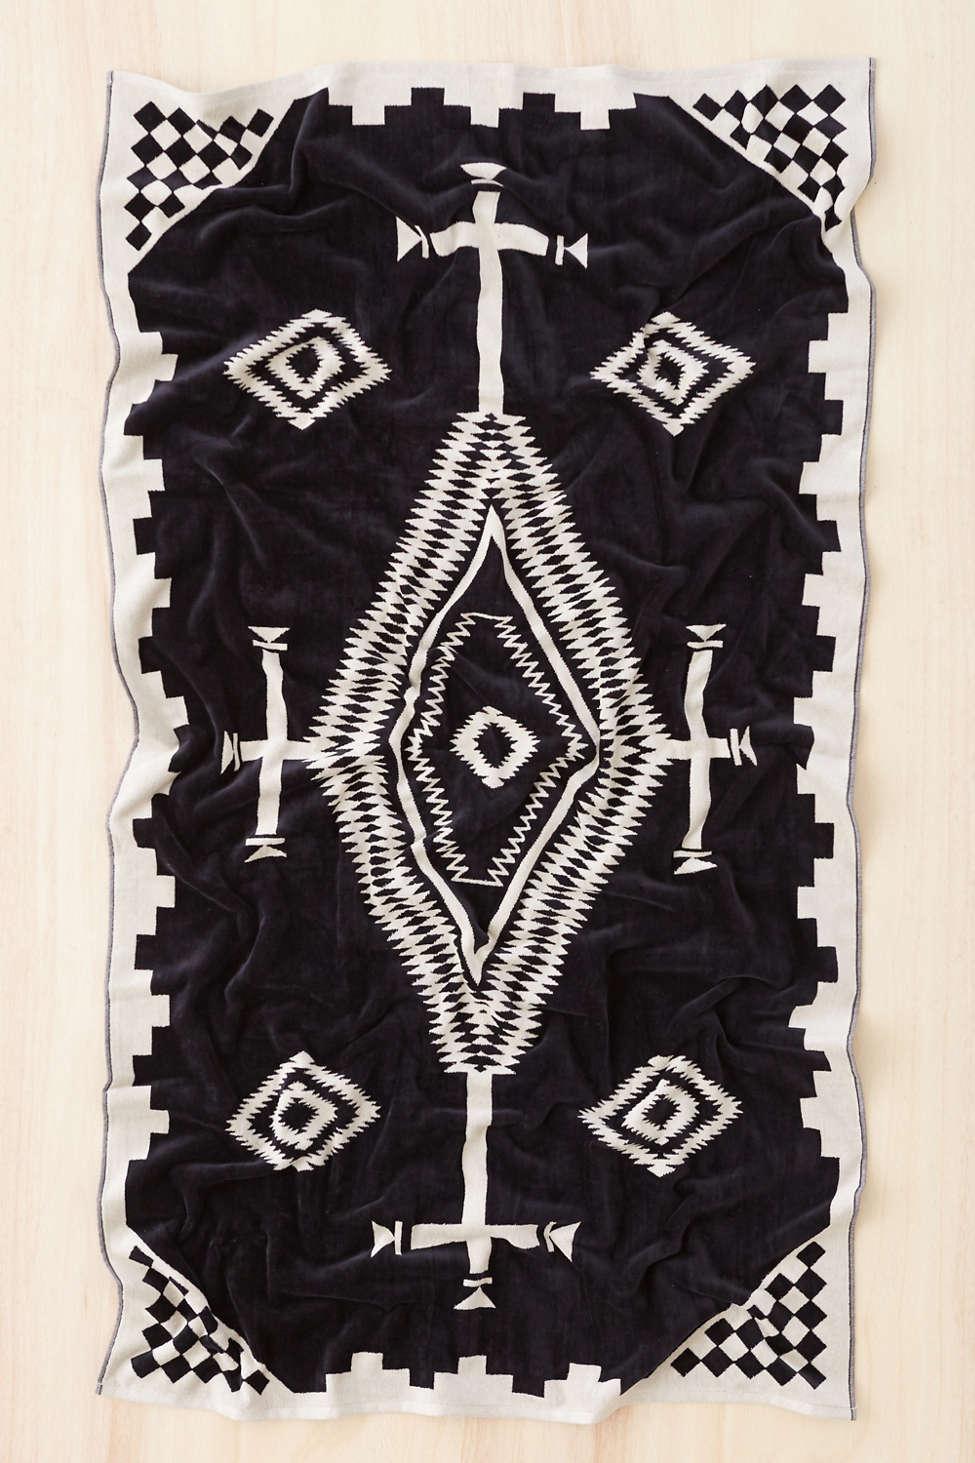 Slide View: 1: Pendleton Los Ojos Oversized Jacquard Towel